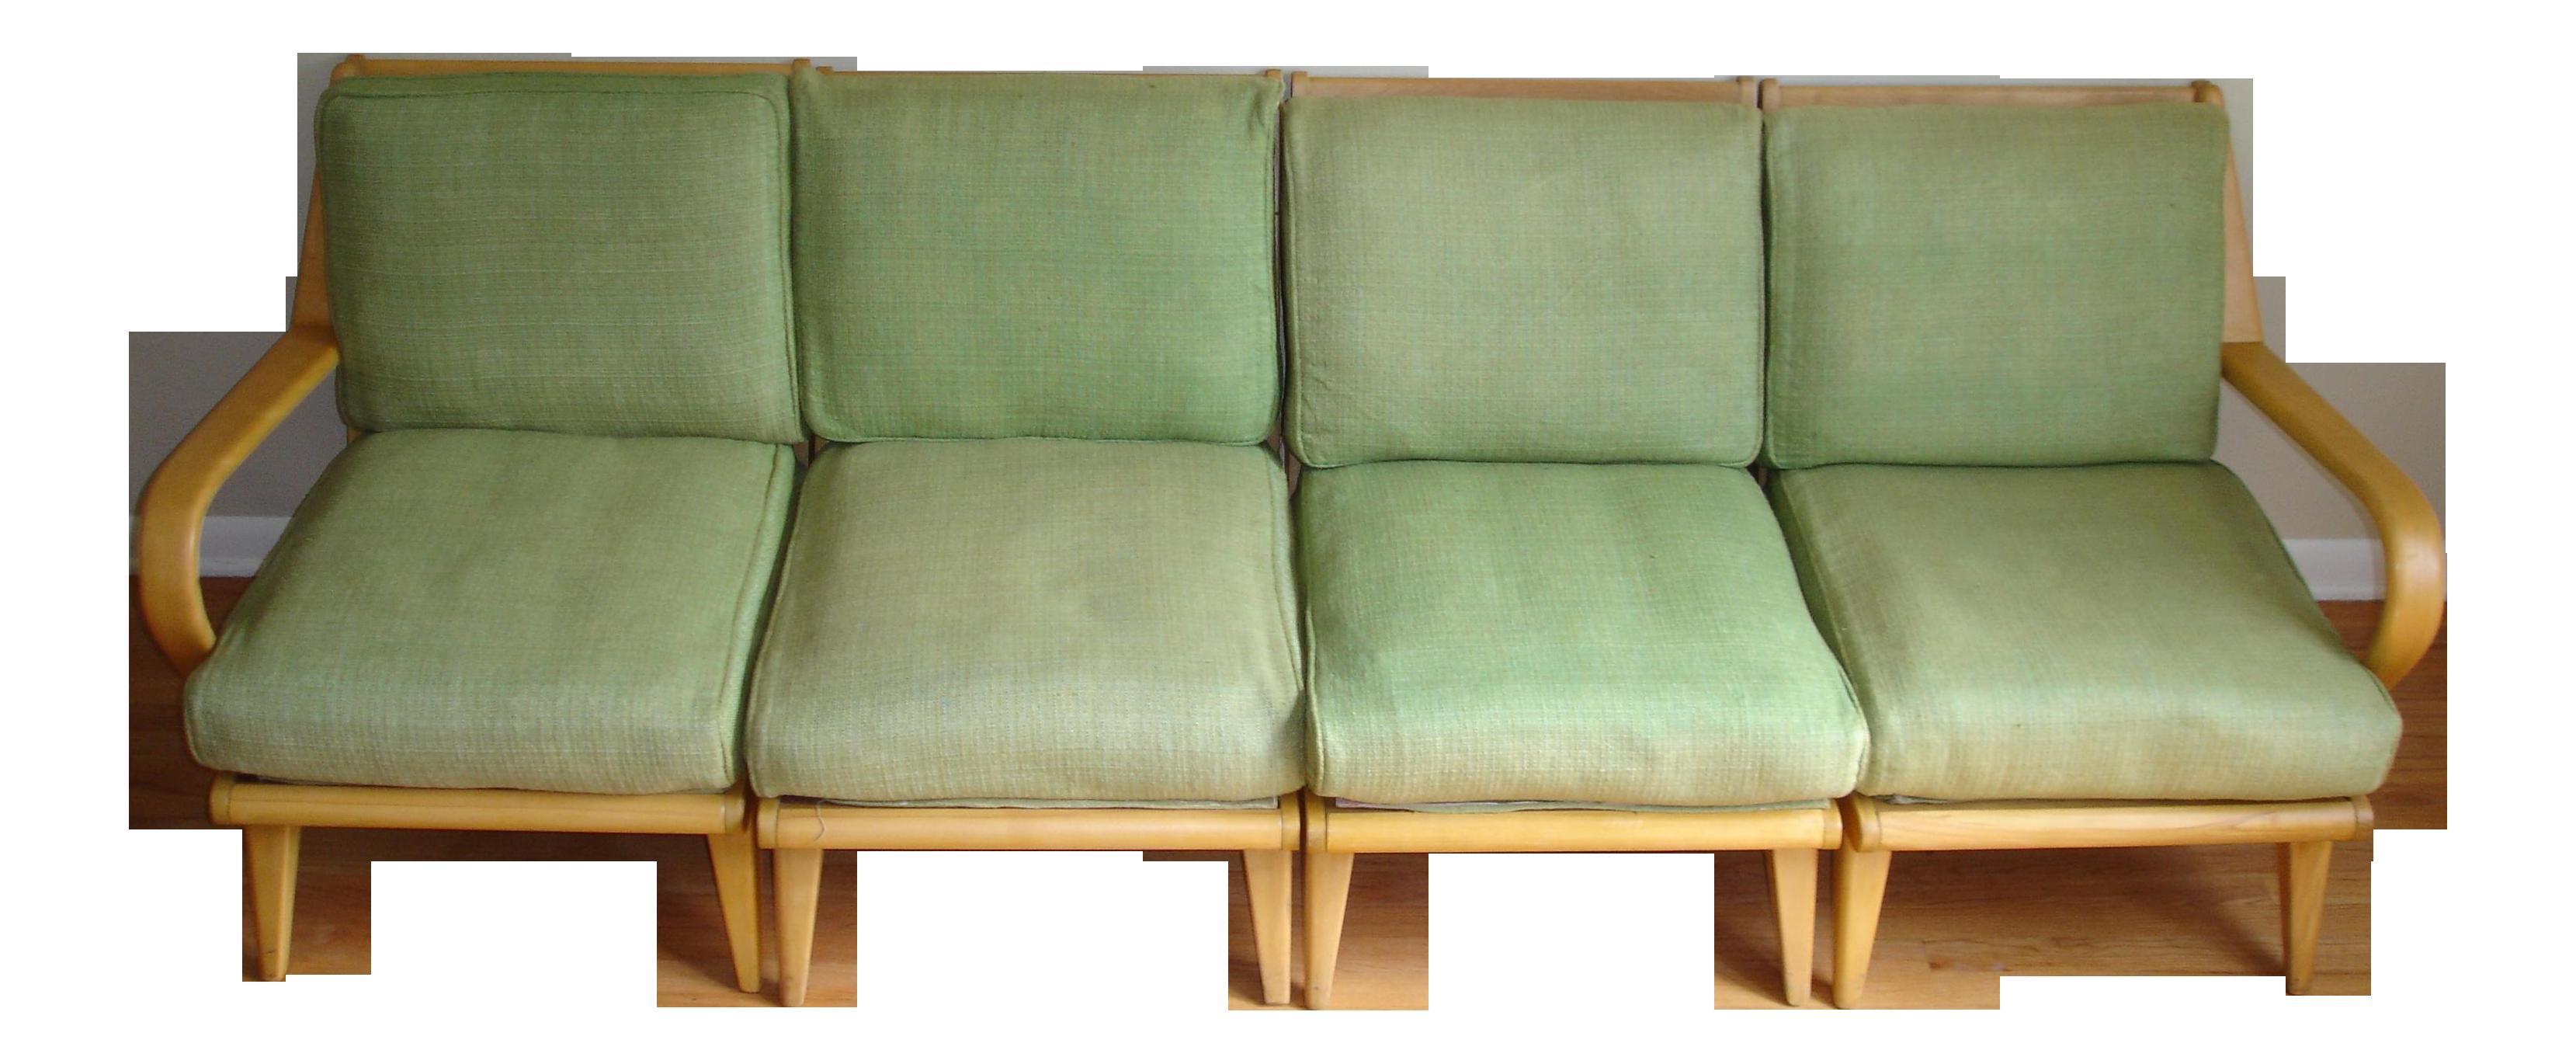 Heywood Wakefield Aristocraft 4 Piece Sectional Sofa